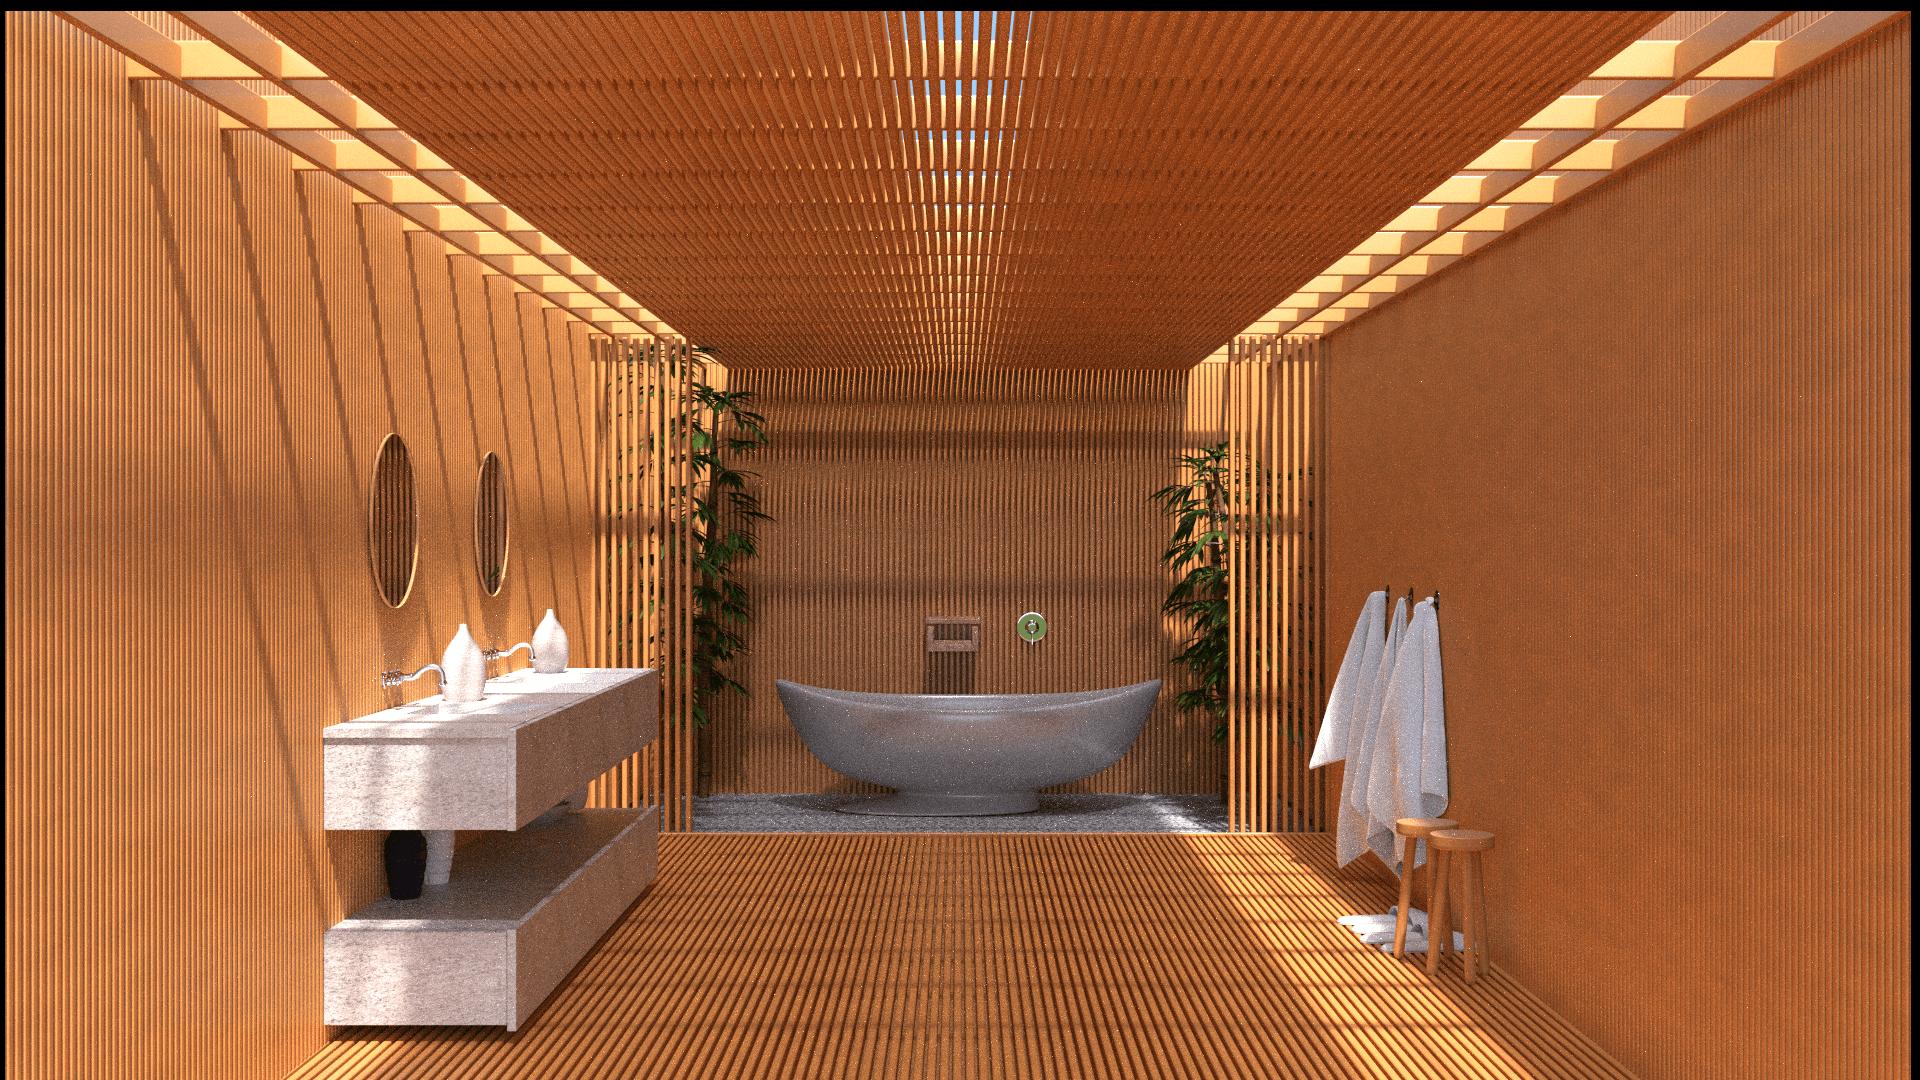 Bathroom Design Where To Start Interior Design Design News And Architecture Trends